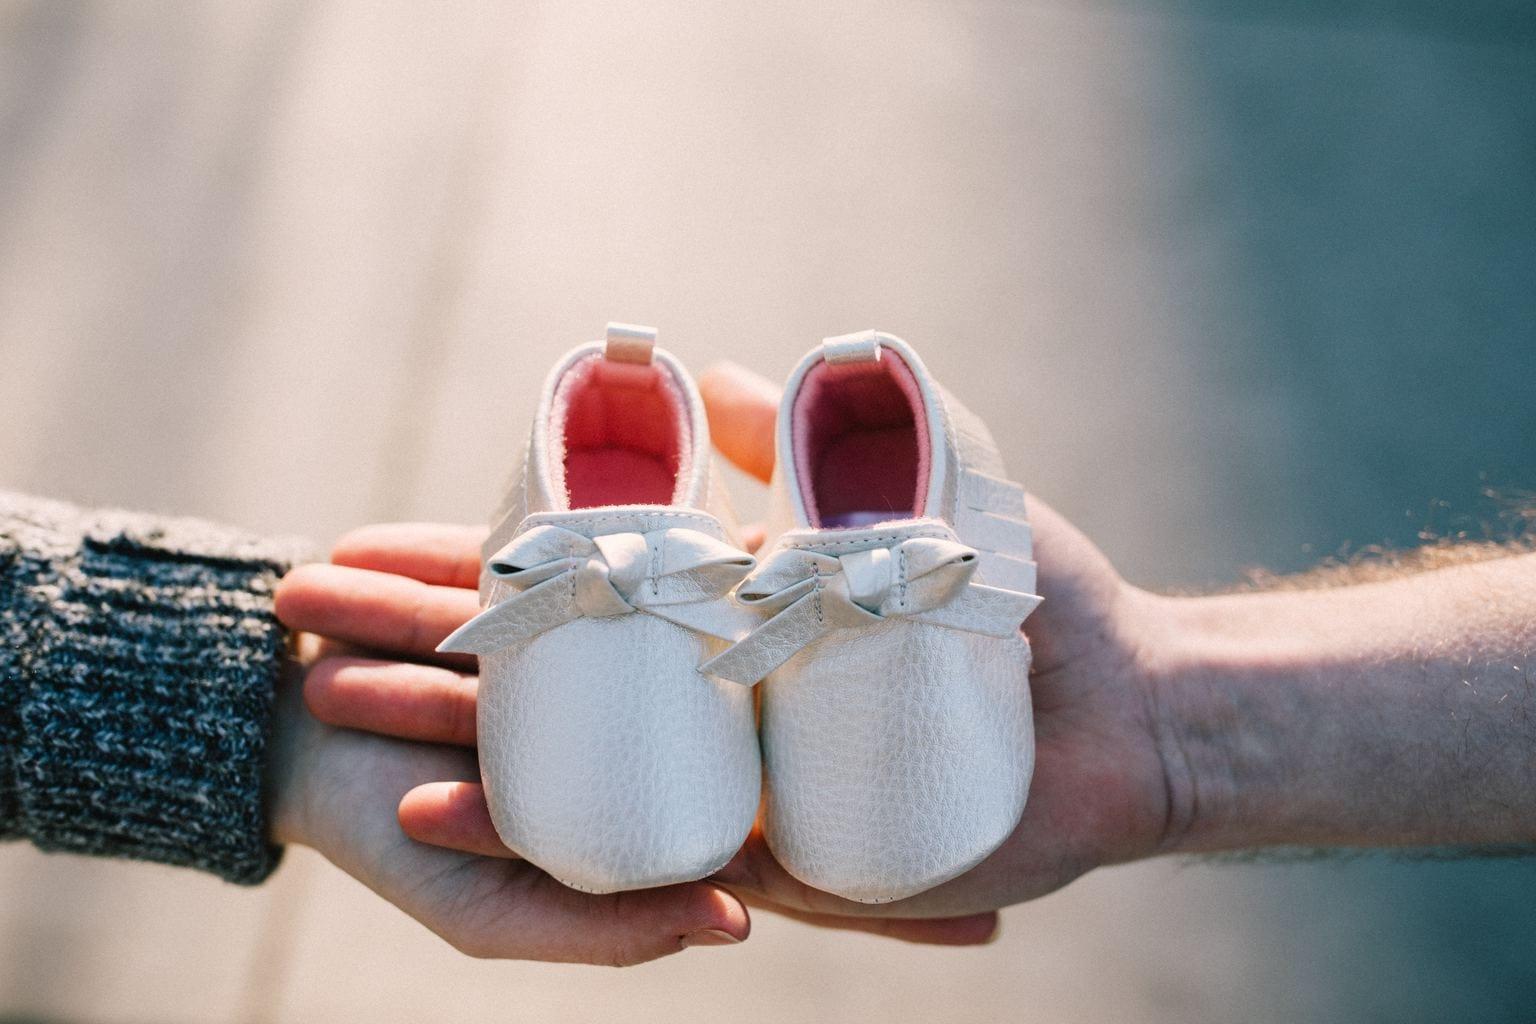 detalle zapatos bebé en sesión embarazo